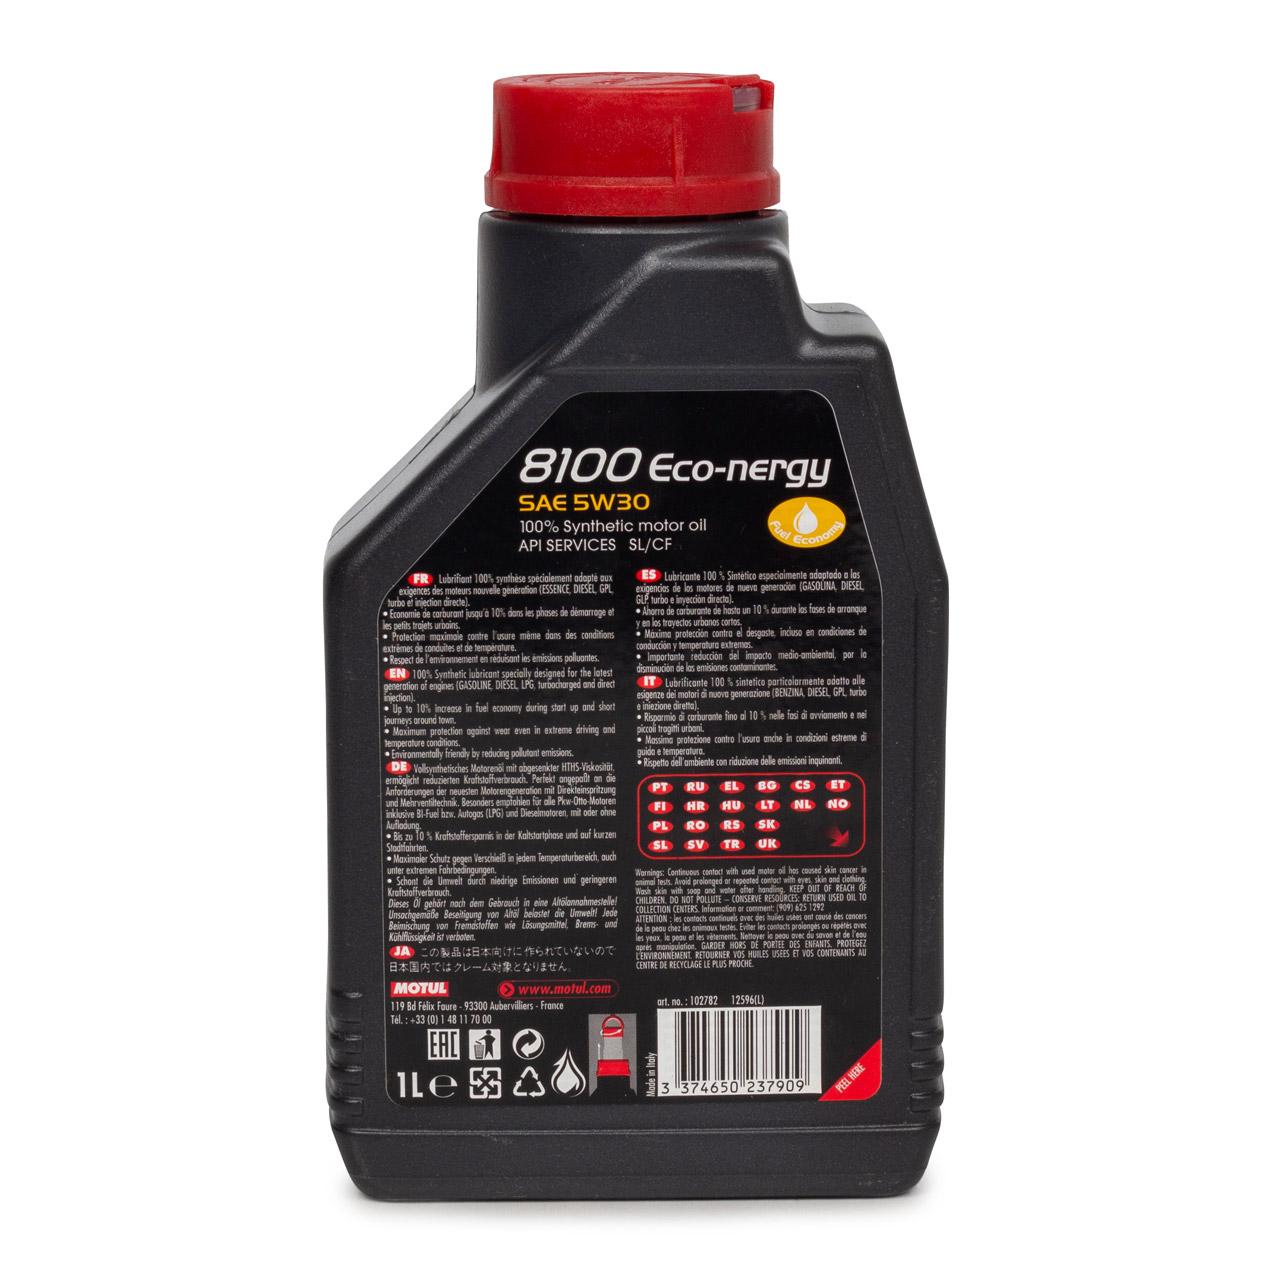 MOTUL 8100 ECO-nergy Motoröl Öl 5W30 FORD WSS M2C 913D RENAULT RN0700 - 1 Liter